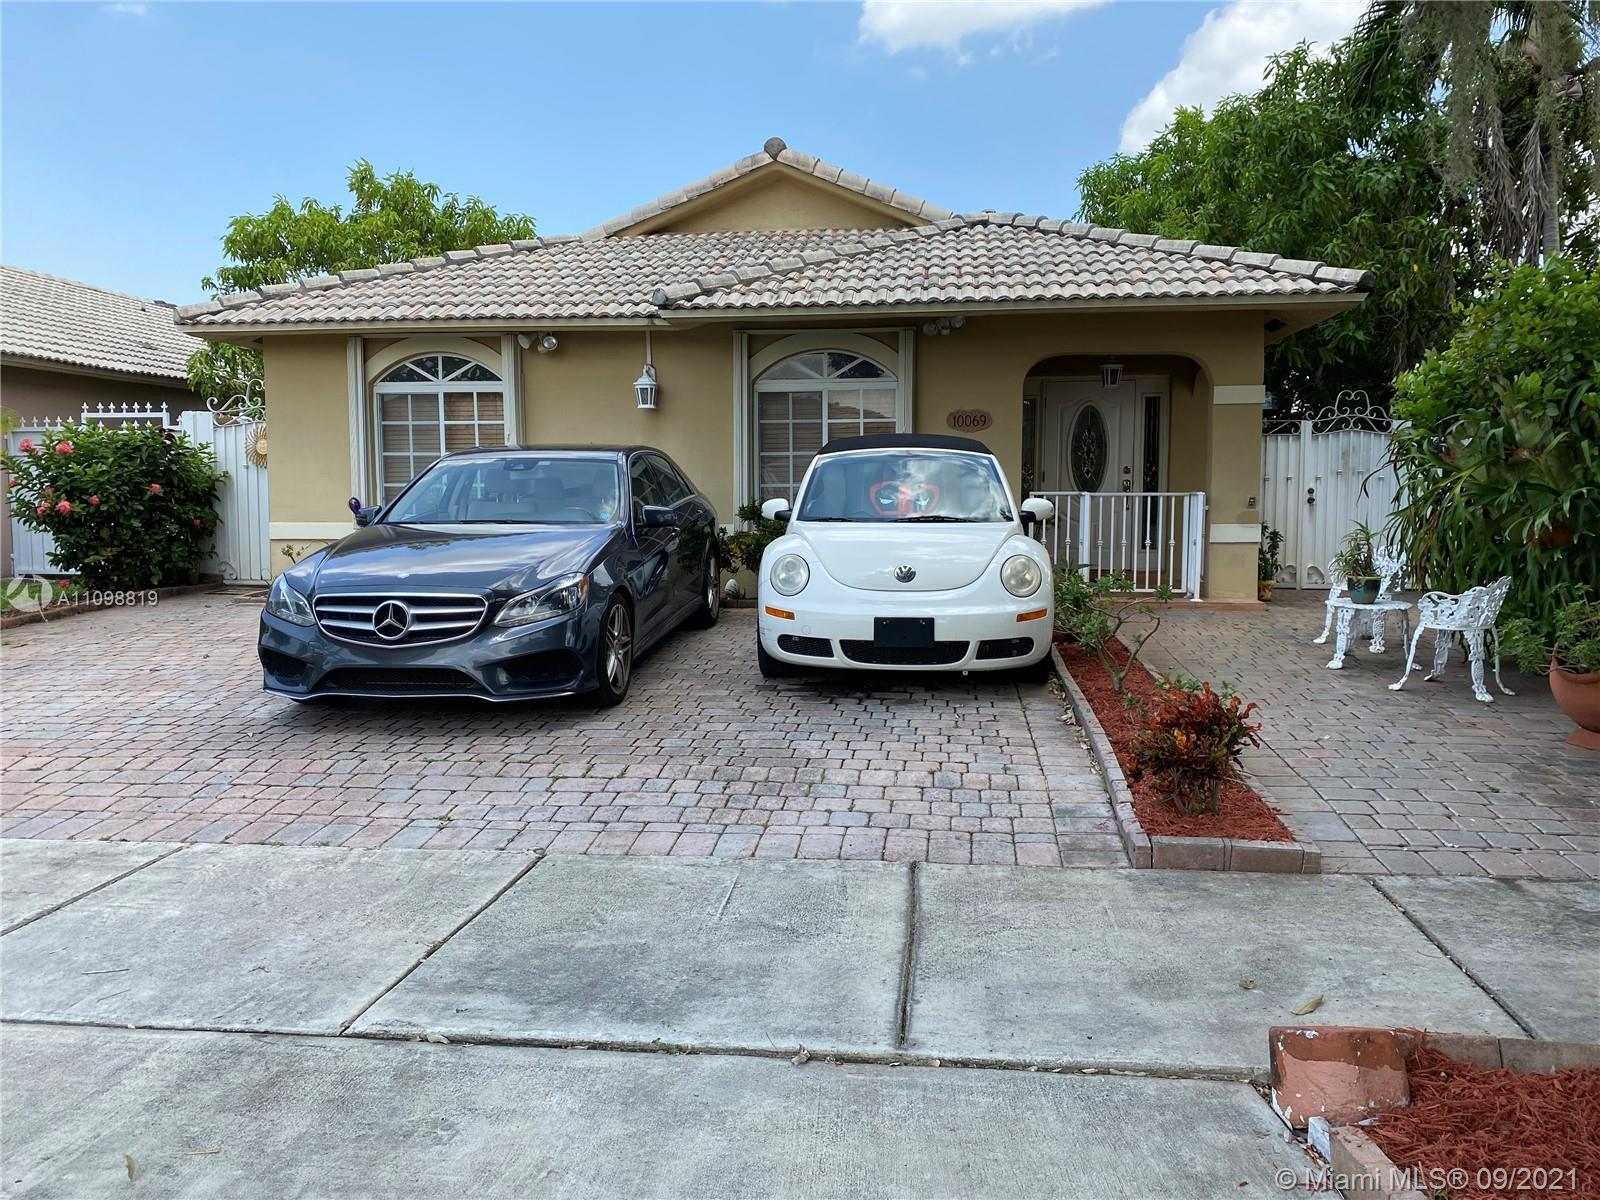 Single Family Home,For Sale,10069 NW 127th Ter, Hialeah Gardens, Florida 33018,Brickell,realty,broker,condos near me